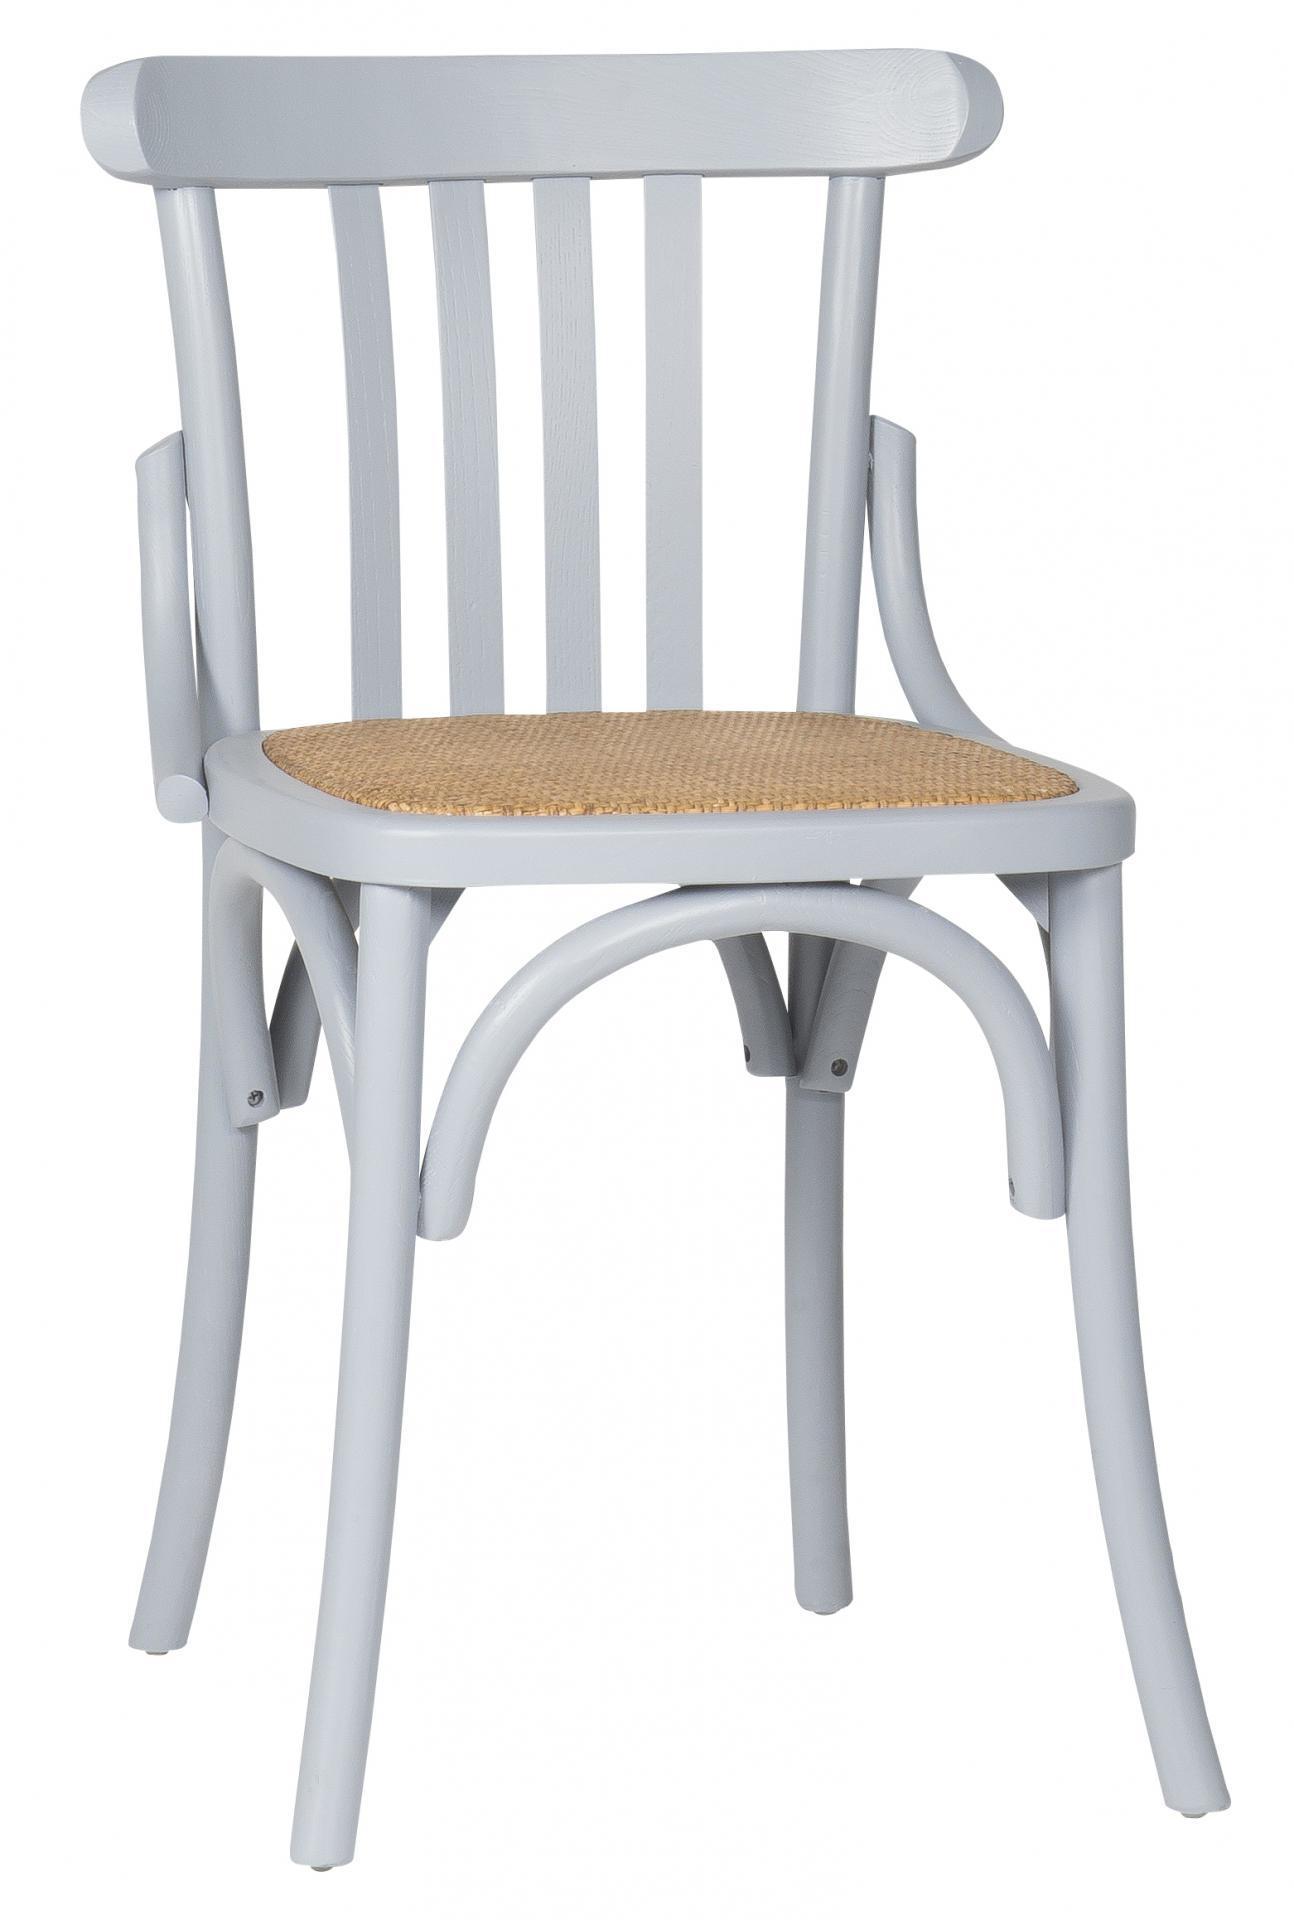 IB LAURSEN Dřevěná židle Marais Grey, šedá barva, dřevo, kov